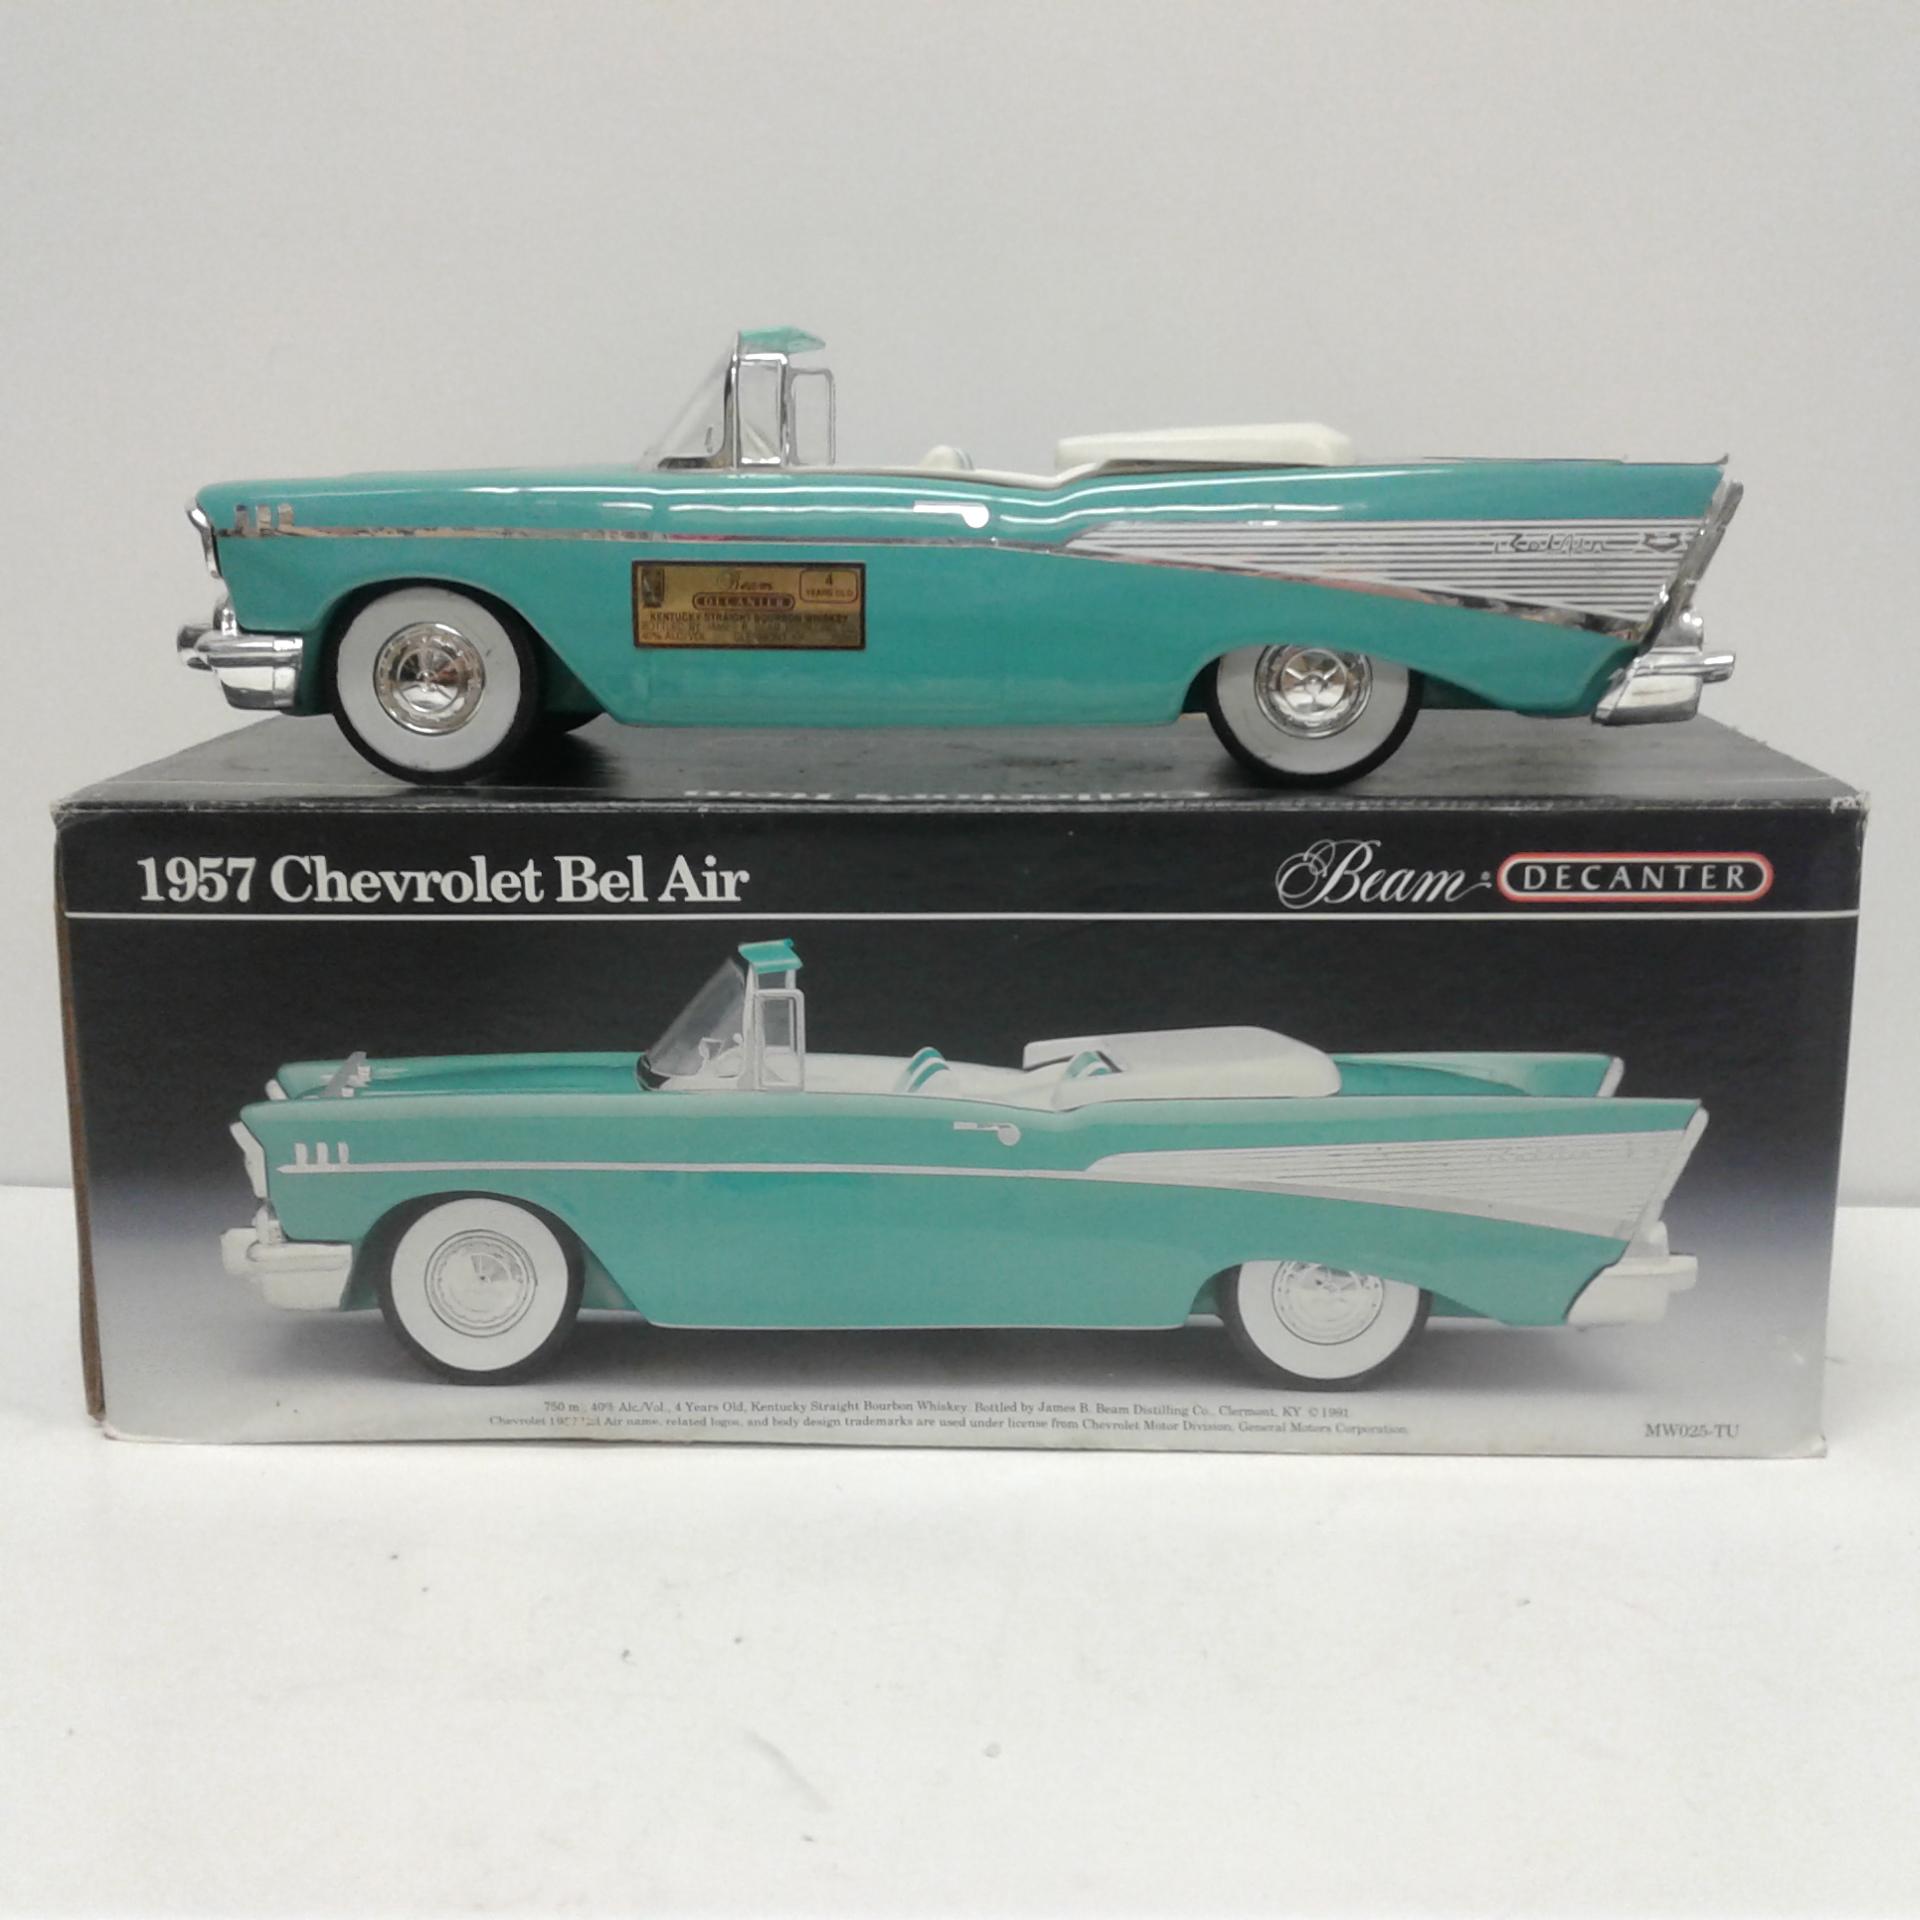 1957 Chevrolet Bel Air Beam Decanter Convertible Ebay Chevy